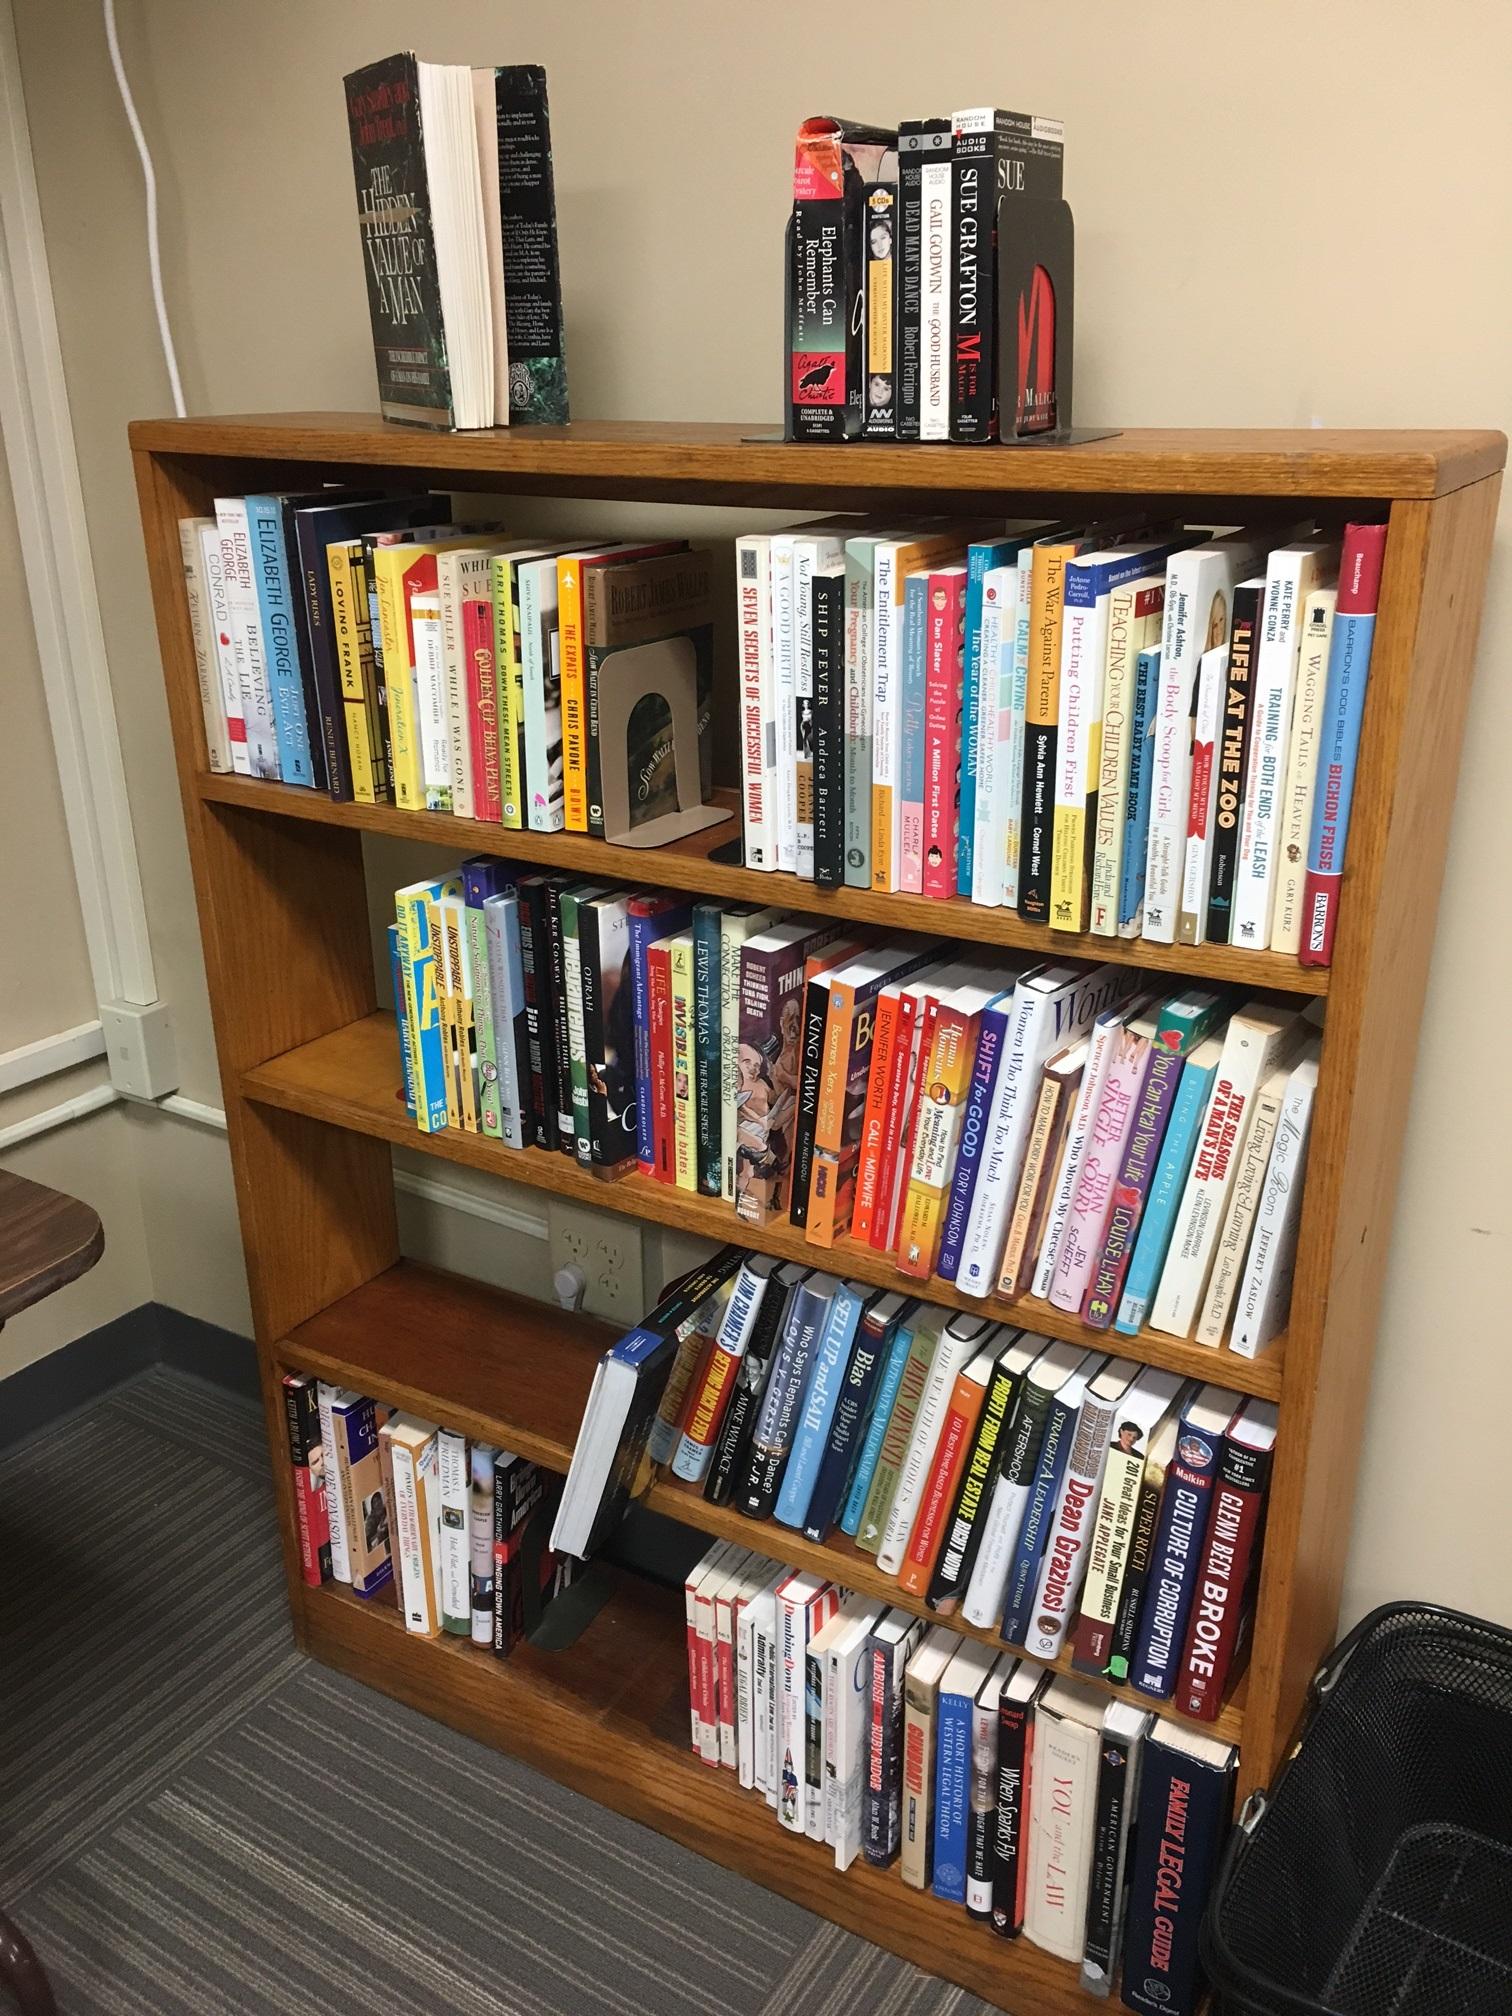 Friends book shop osterhout free library follow link fandeluxe Images